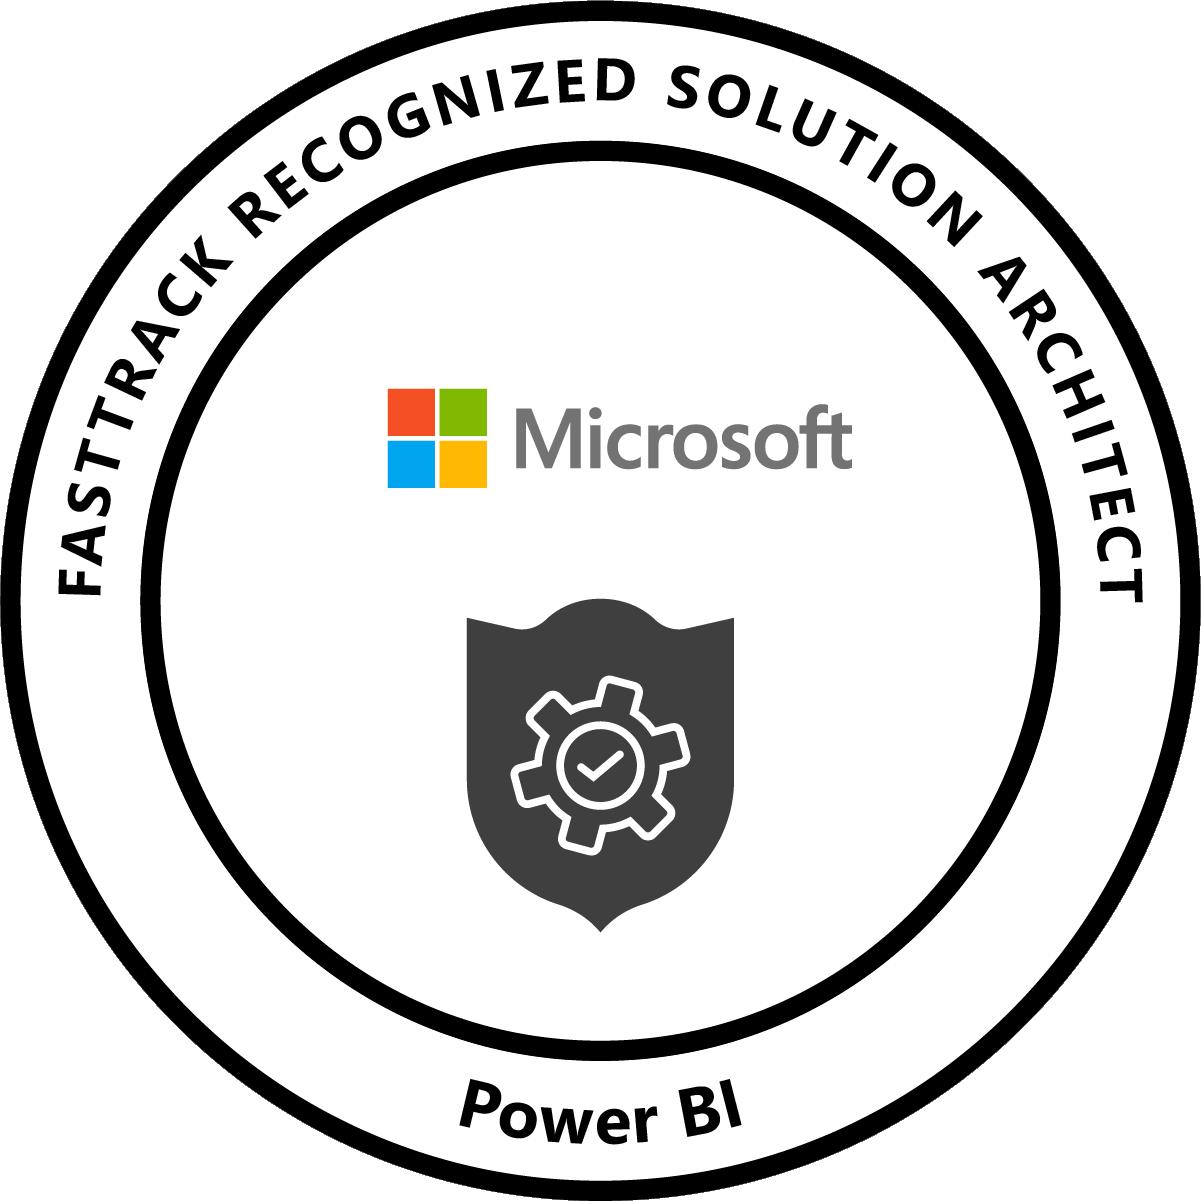 FastTrack Recognized Solution Architect - Power BI